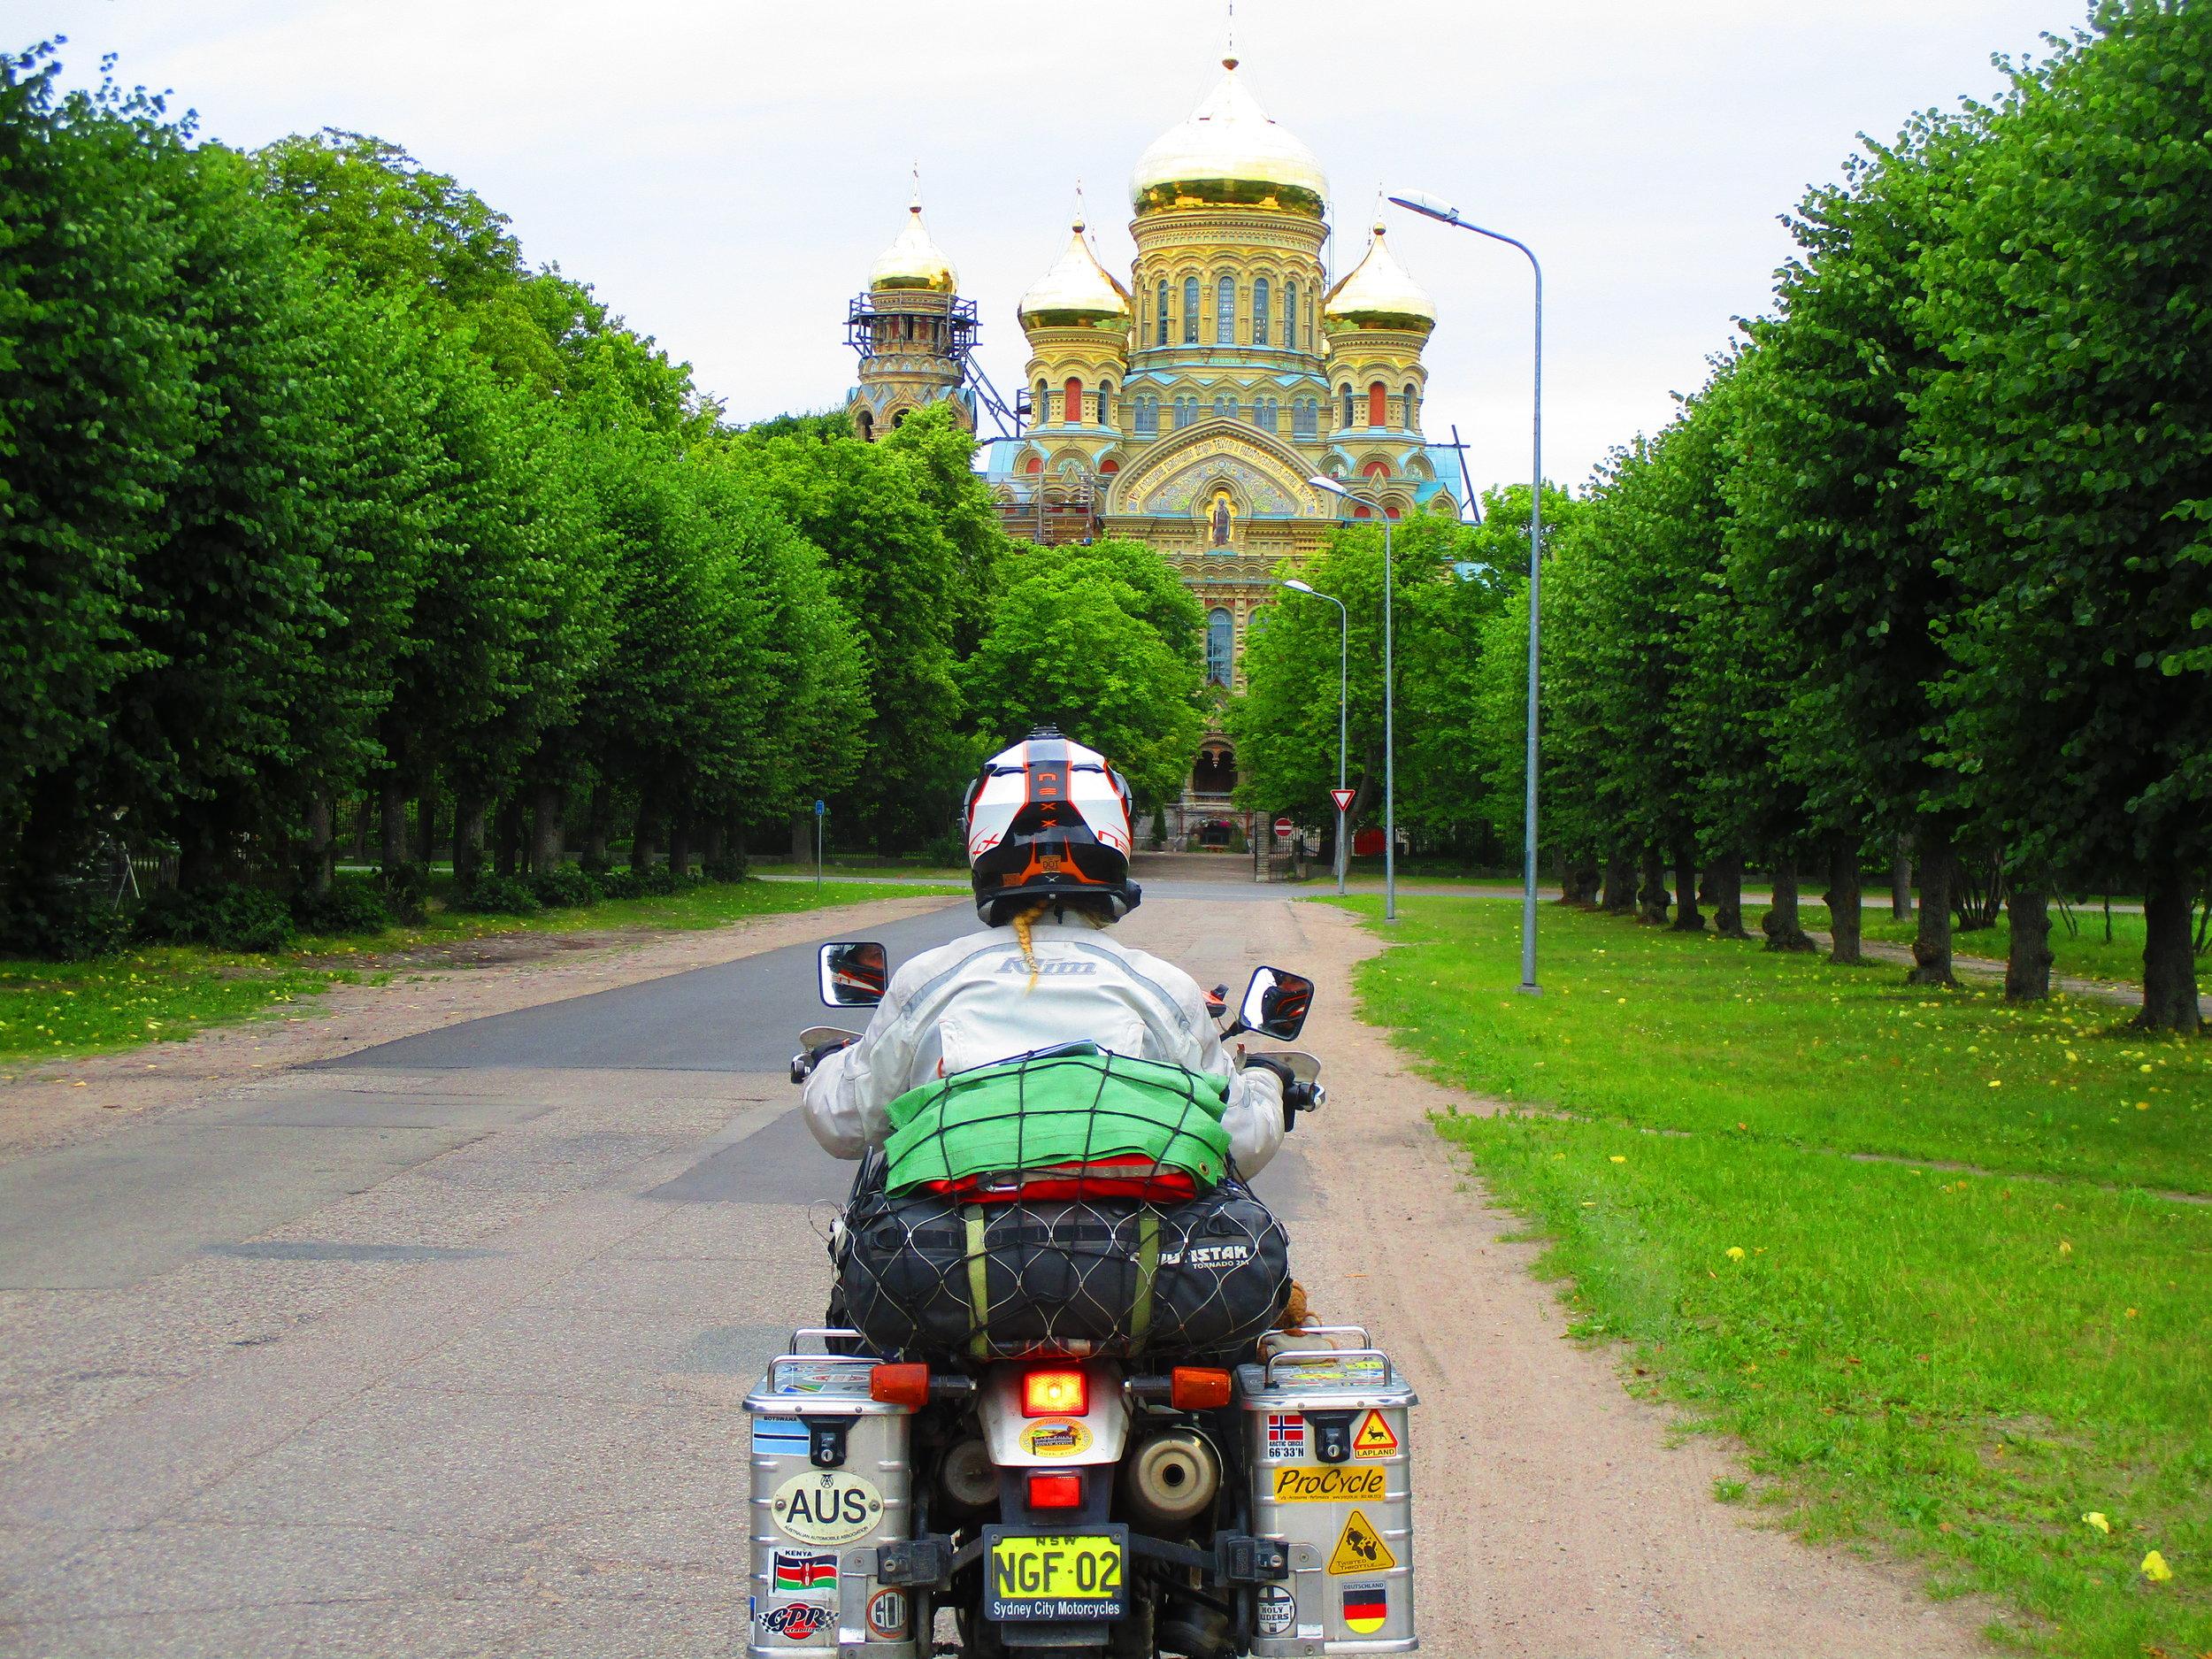 The Orthodox church in Karosta, Latvia